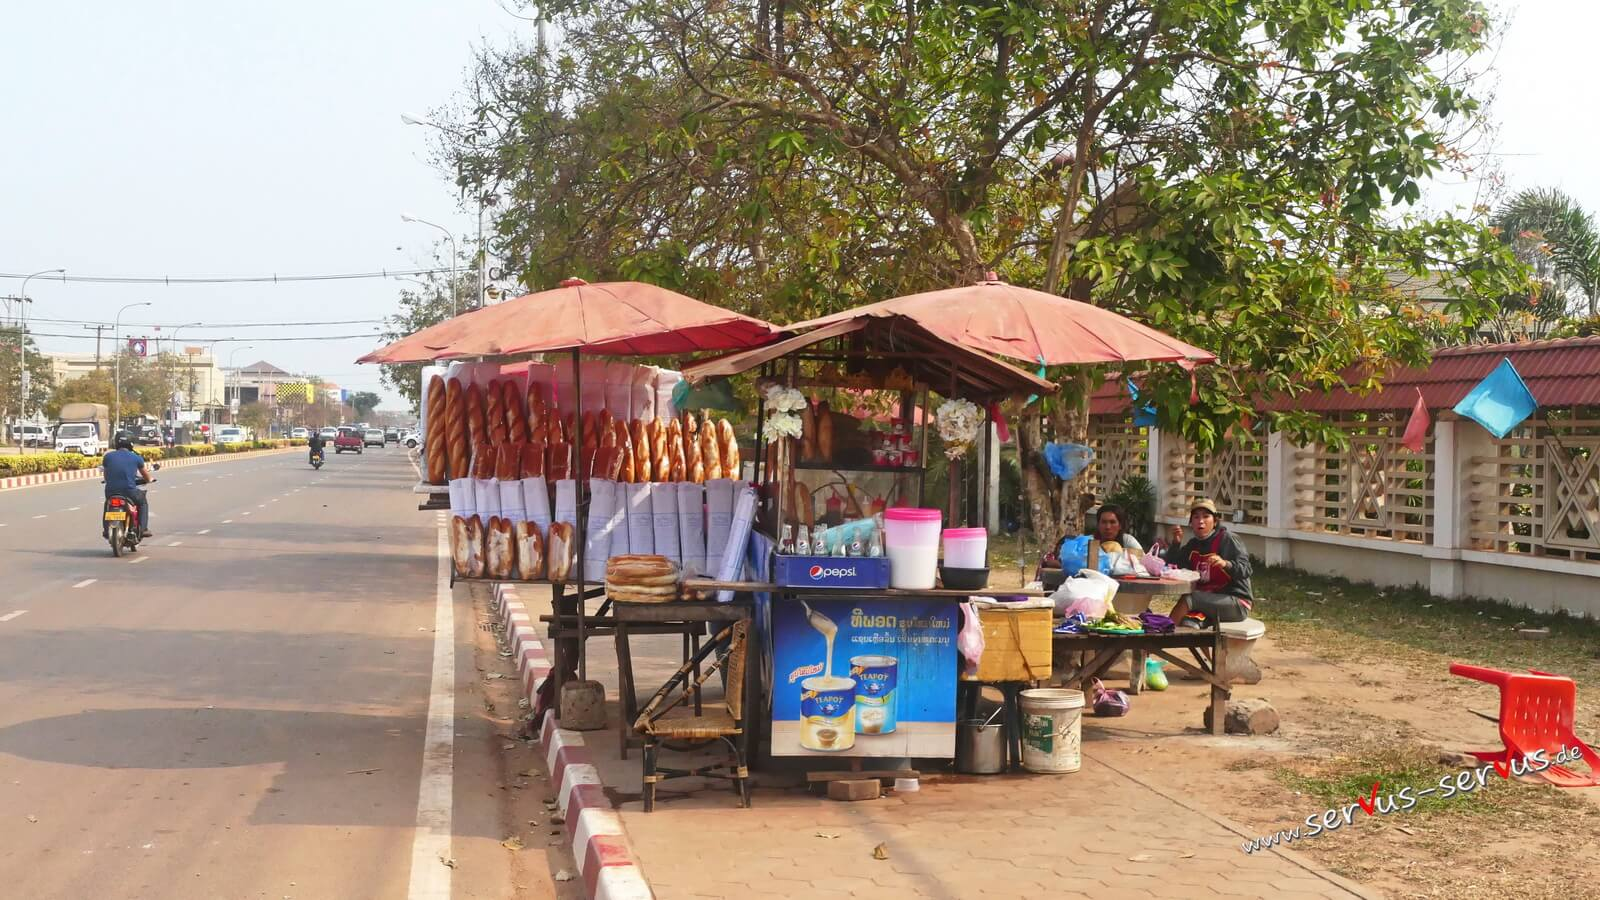 Baguette, Laos, Vientiane,